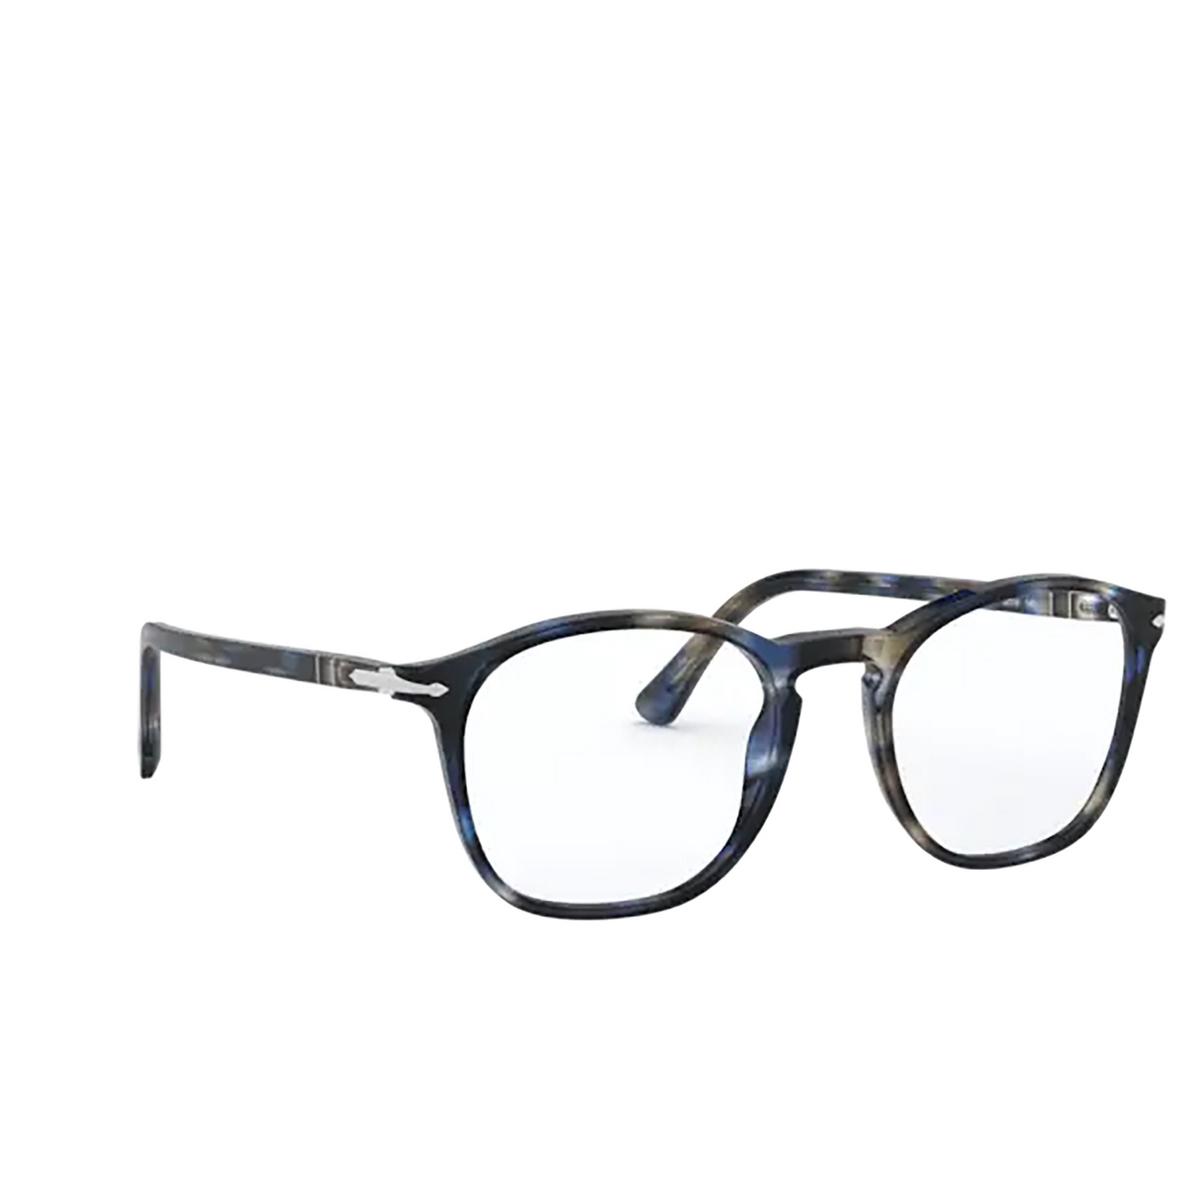 Persol® Square Eyeglasses: PO3007VM color Striped Blue & Grey 1126 - three-quarters view.